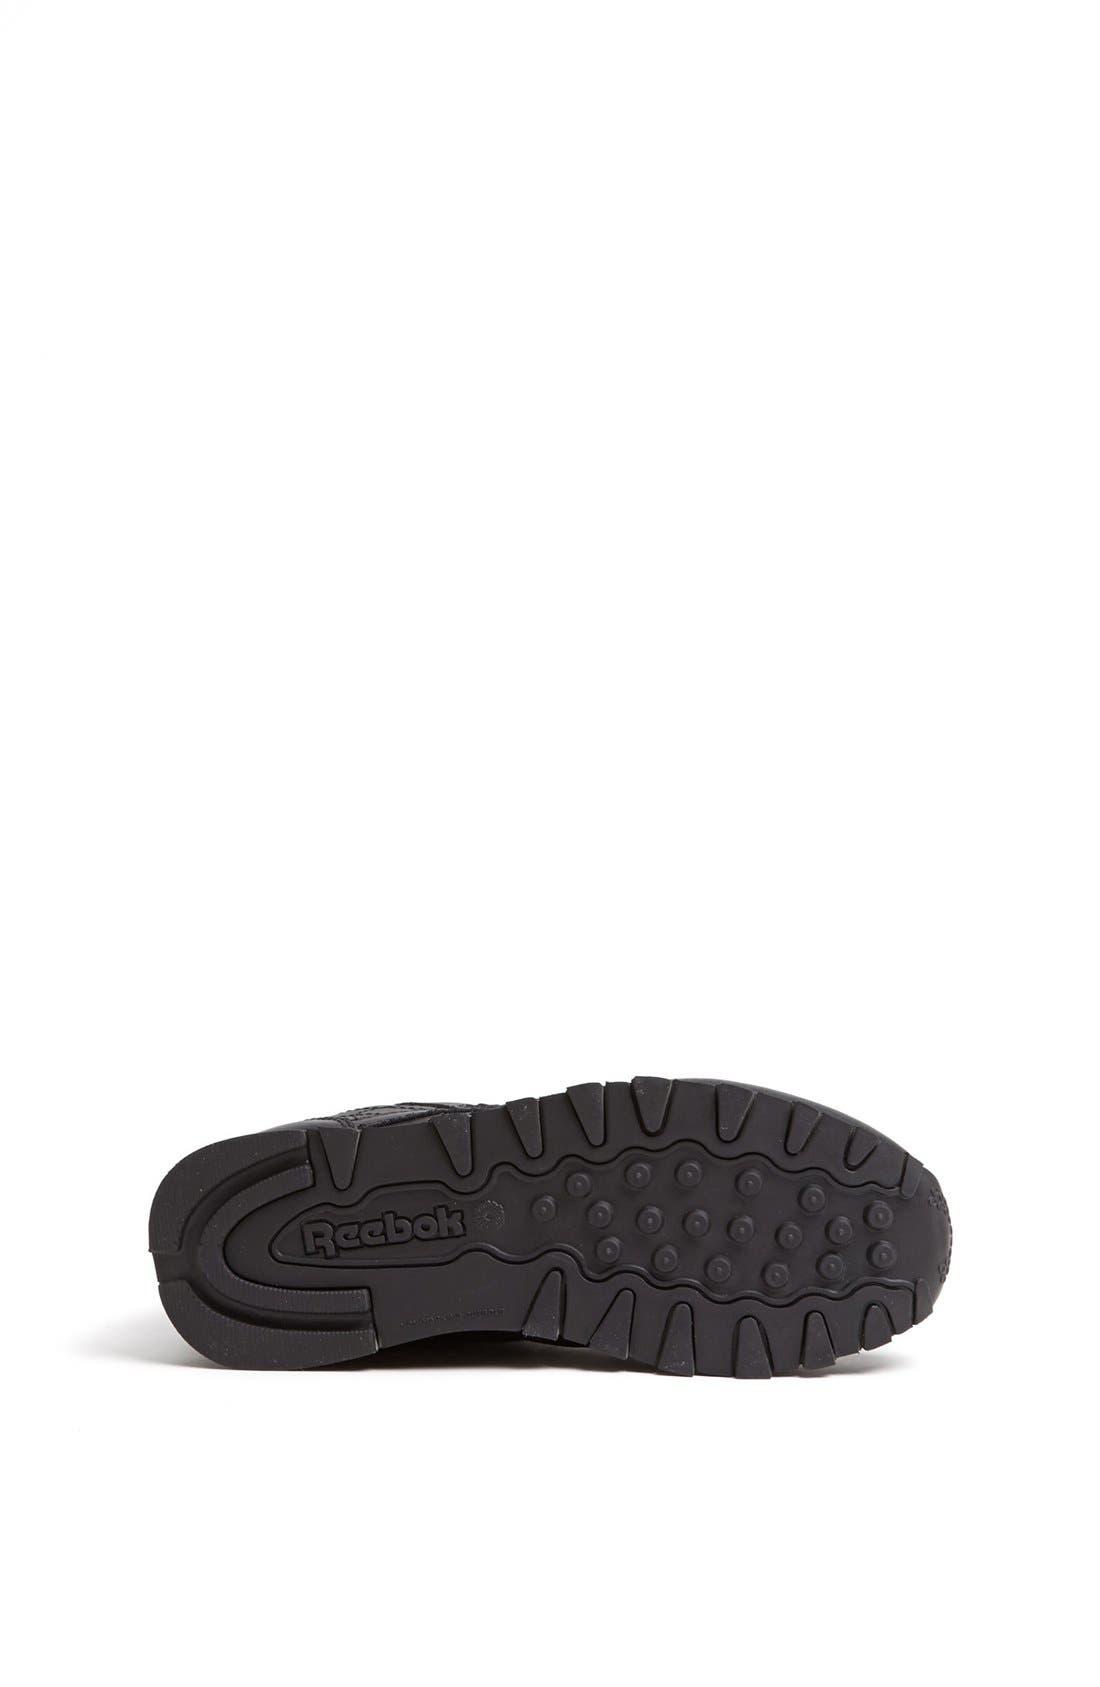 Alternate Image 4  - Reebok 'Classic' Leather Sneaker (Toddler & Little Kid)